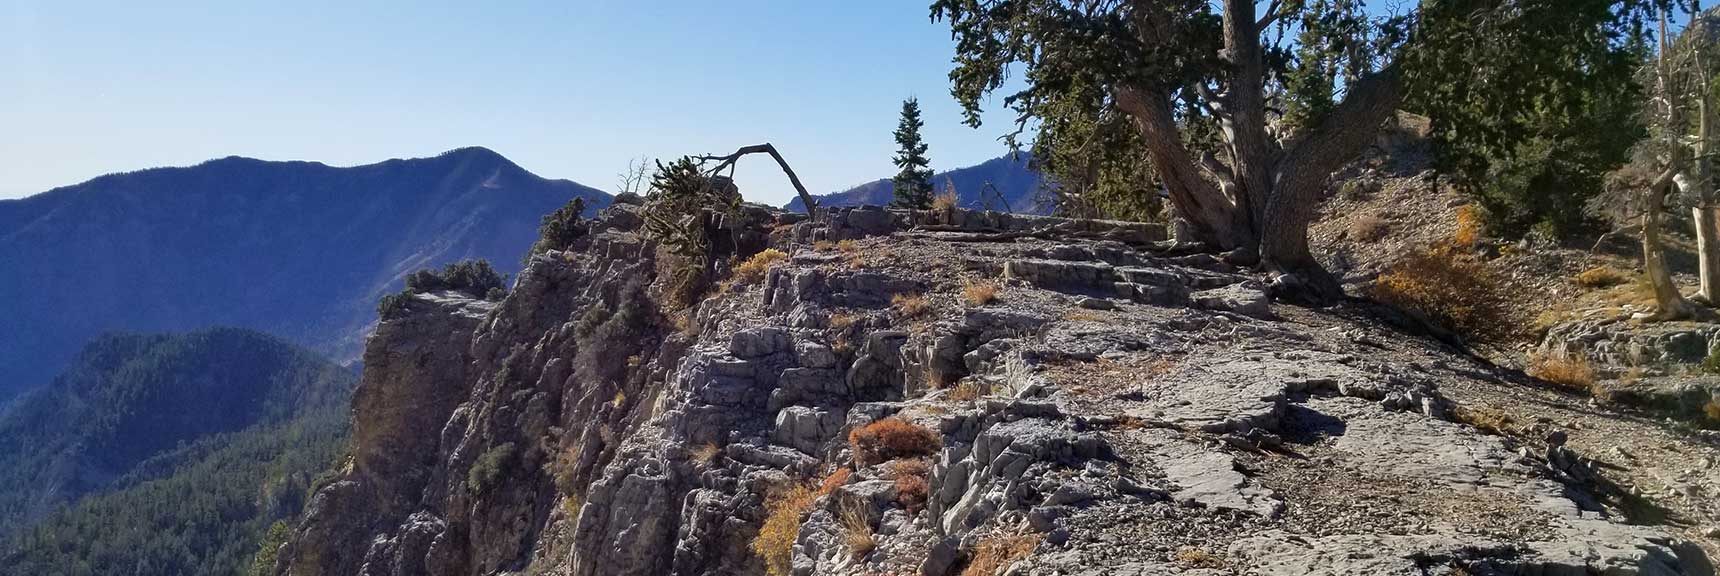 Harris Mountain viewed from Cockscomb Ridge, Cockscomb Ridge Wilderness Circuit in Mt. Charleston Wilderness, Nevada